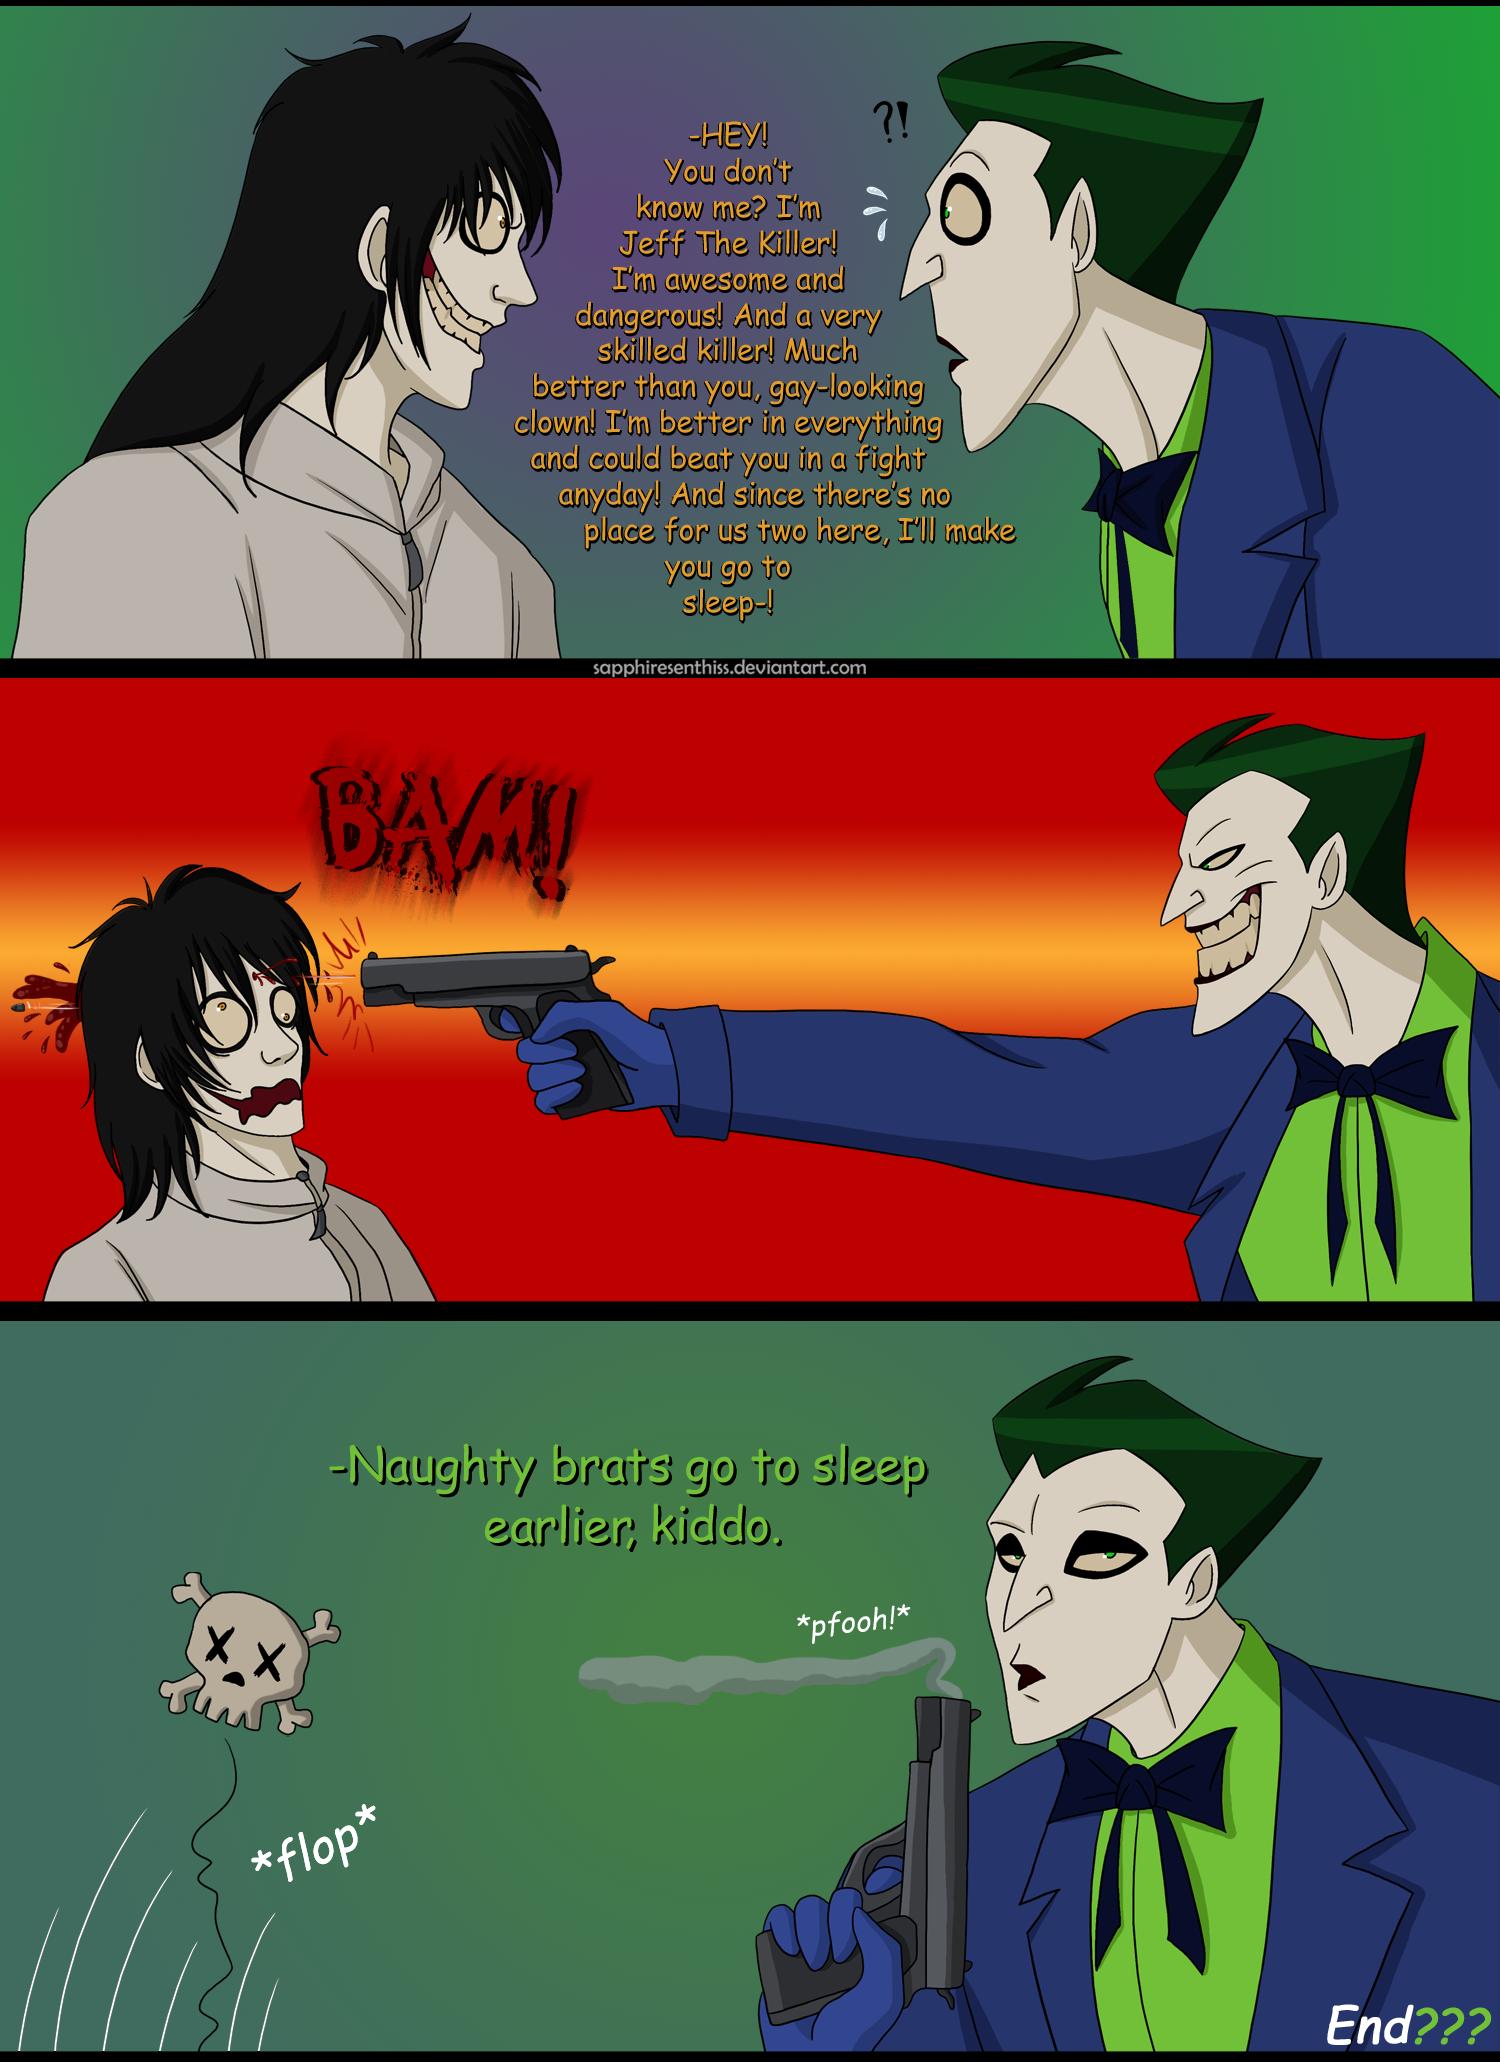 The Joker VS Jeff The Killer (RANT IN DESCRIPTION) by